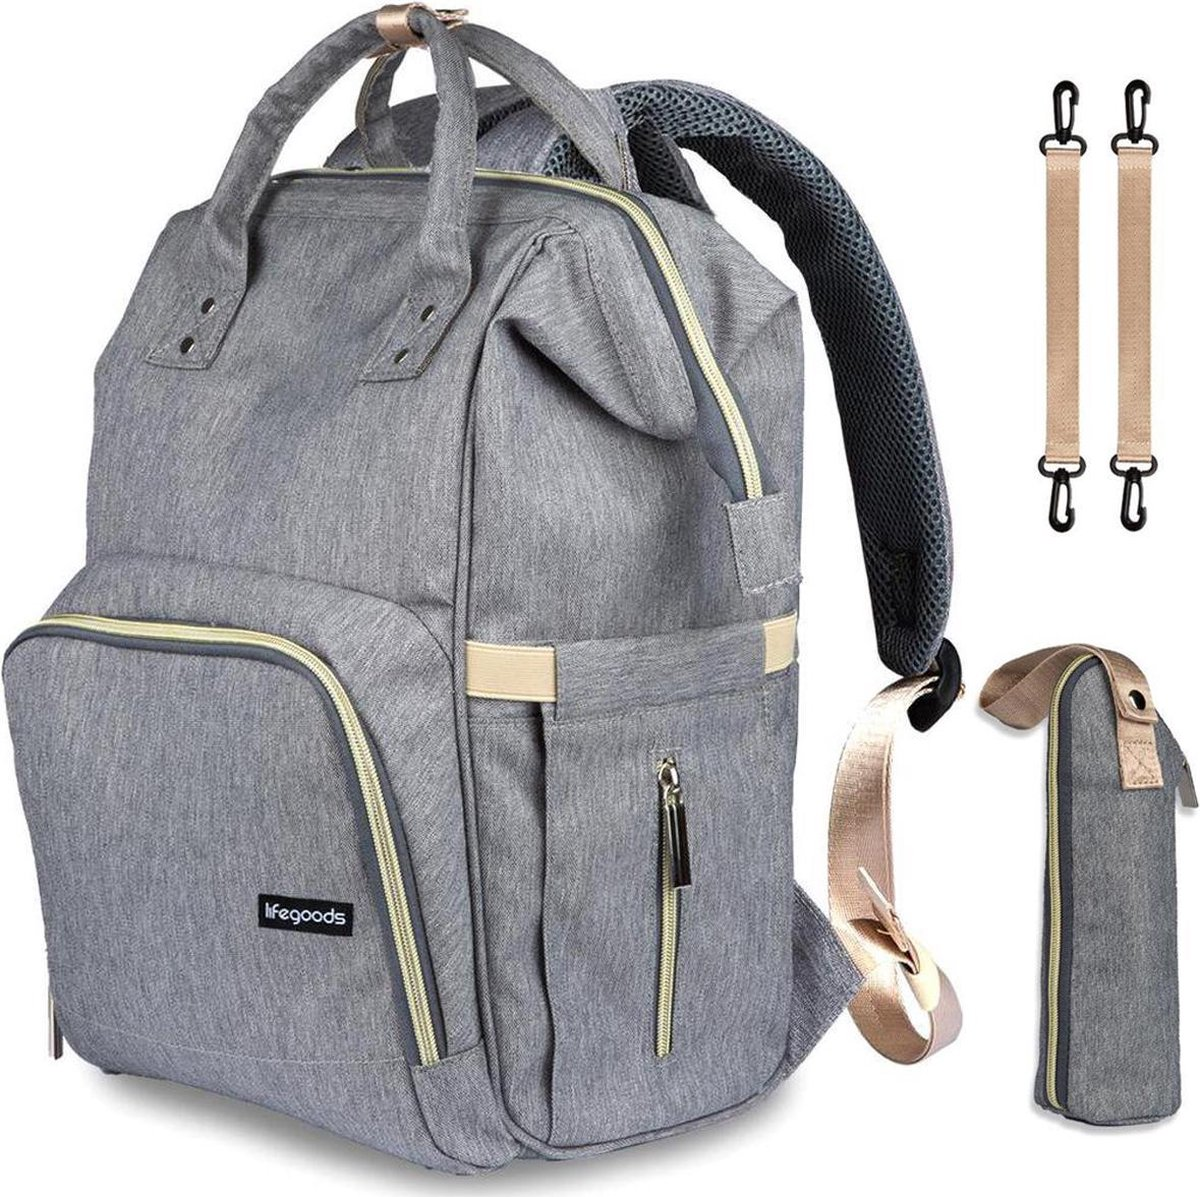 LifeGoods Luier- en Verzorgingstas - Baby Rug Tas met Isoleervak - Diaper Backpack Bag - Reis Rugzak